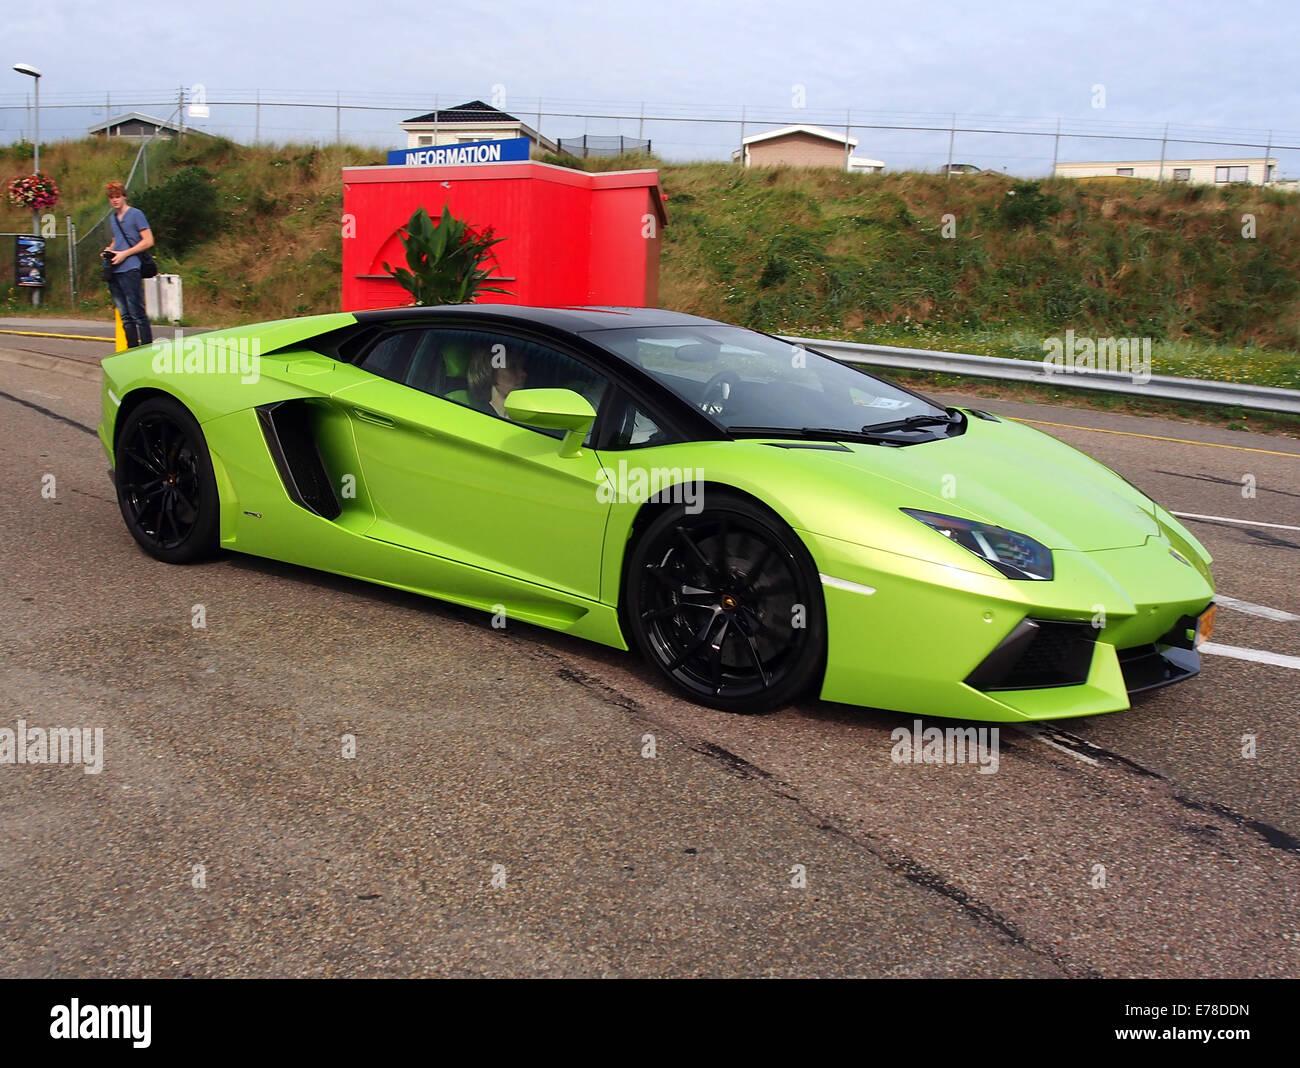 Green LAMBORGHINI AVENTADOR, licence 2-TJD-38, pic2 - Stock Image